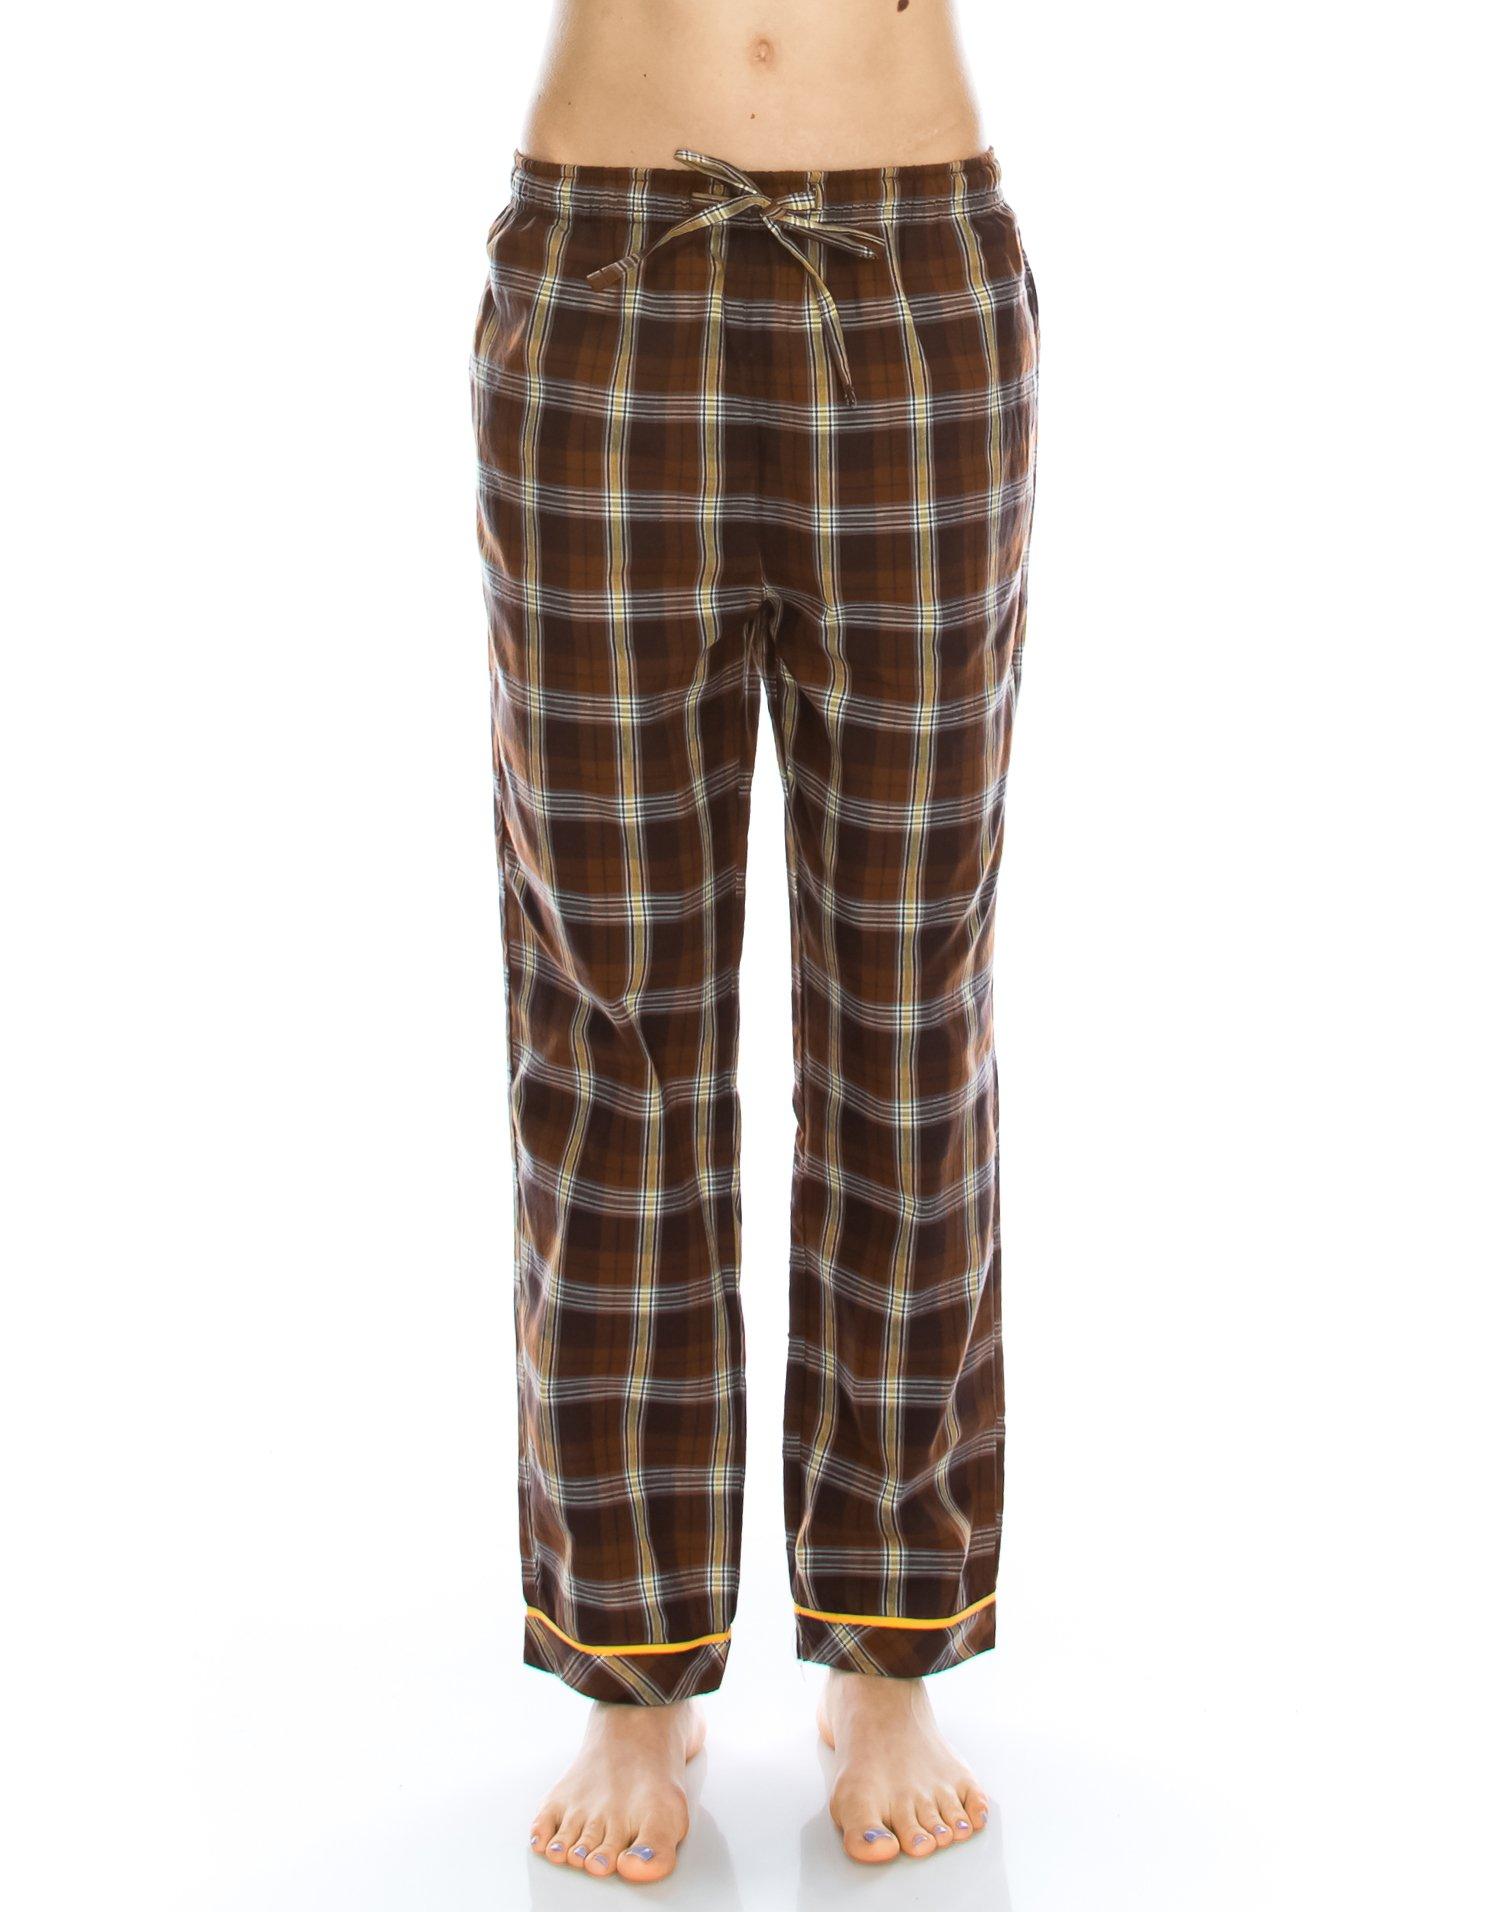 TINFL Girls Soft 100% Cotton Pajama Lounge Sleep Pants PW-01-Darkbrown-L